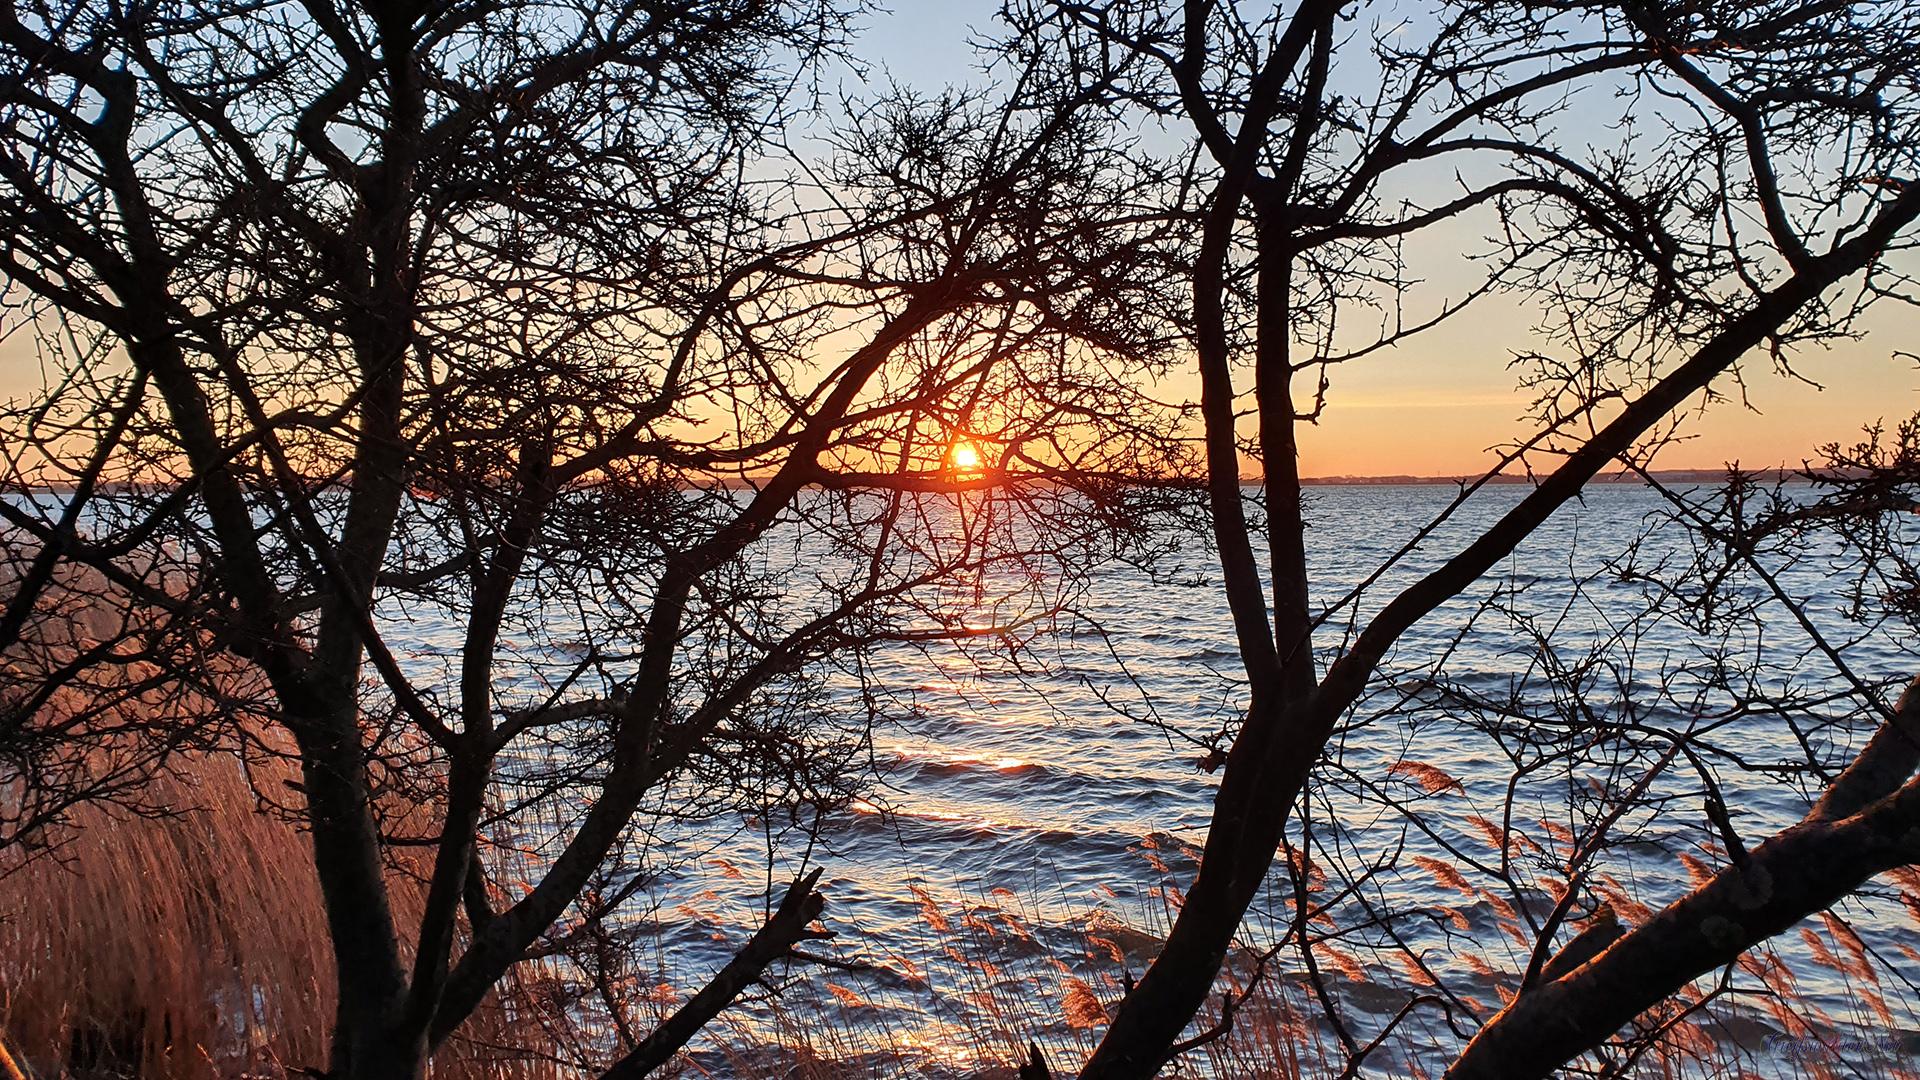 Sonnenaufgang an der Dänischen Wiek in Greifswald-Wieck